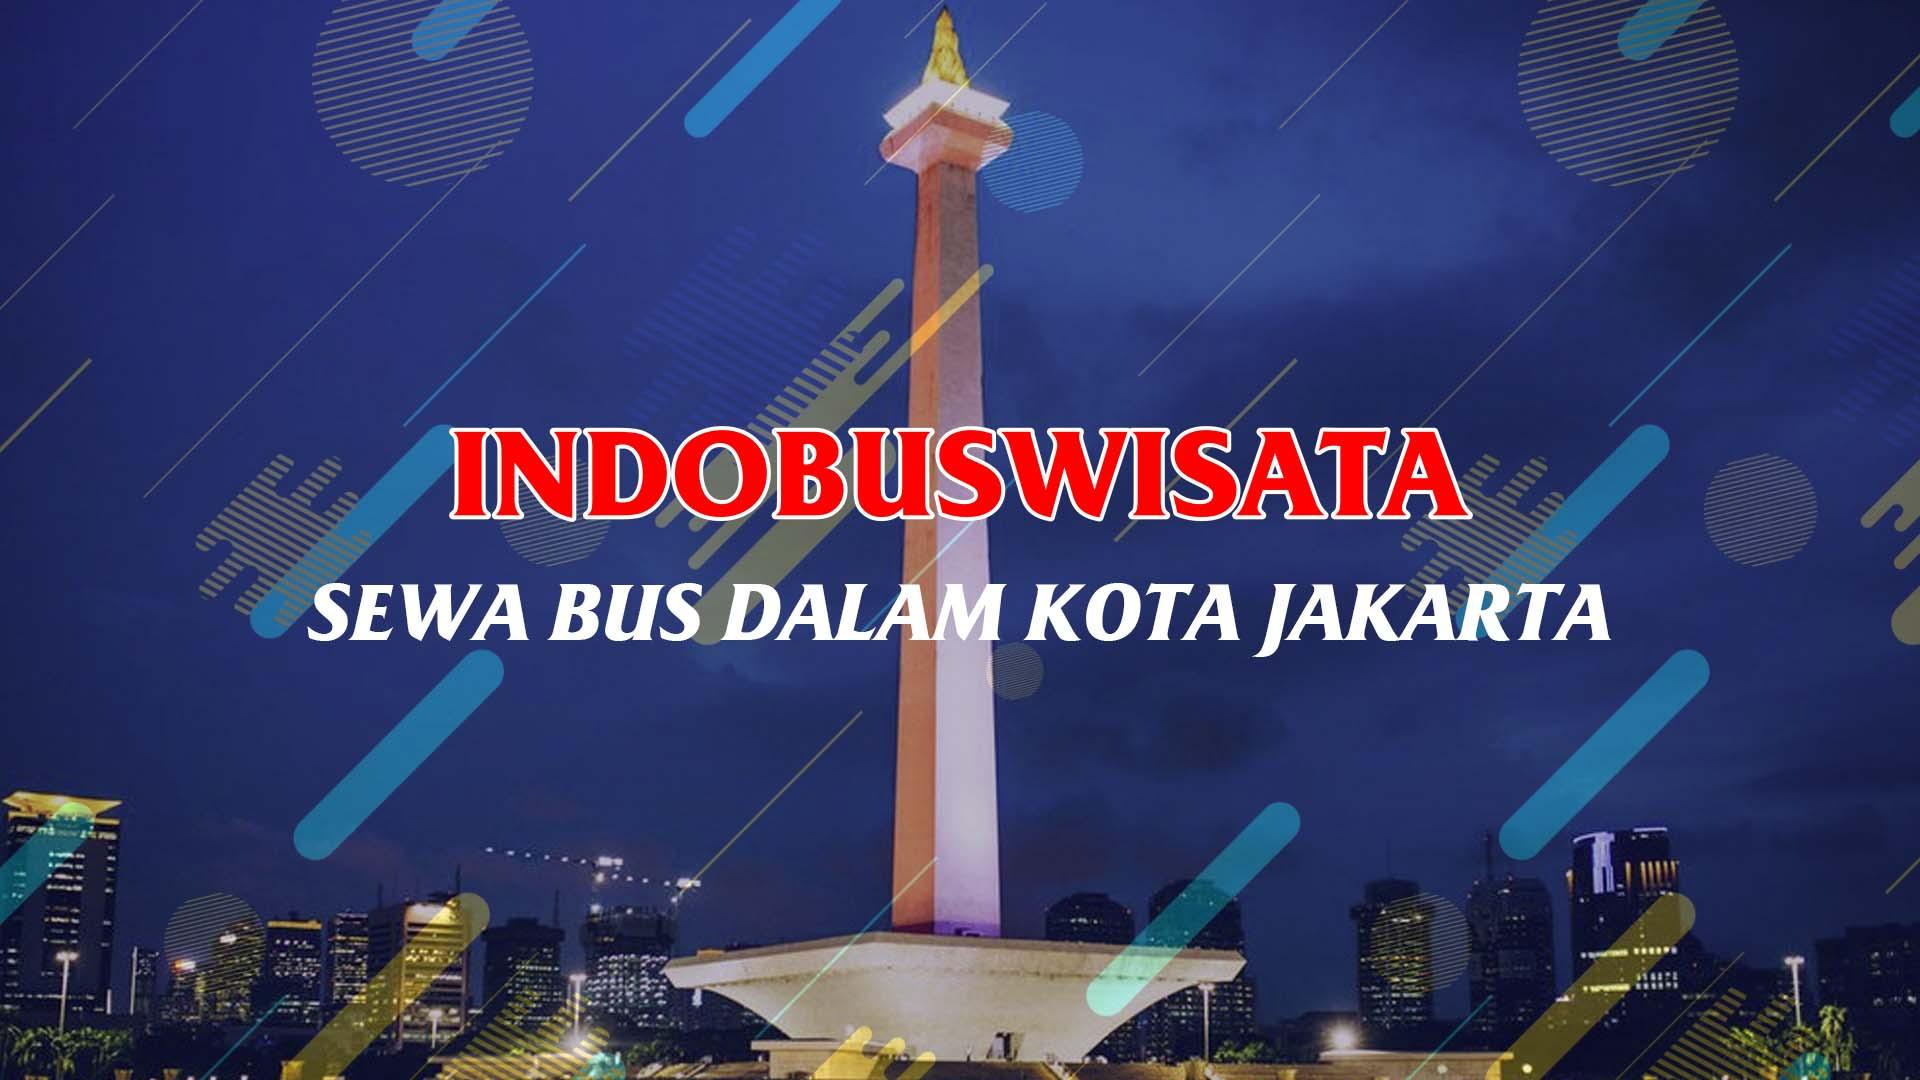 Sewa Bus Dalam Kota Di Jakarta - Indobuswisata